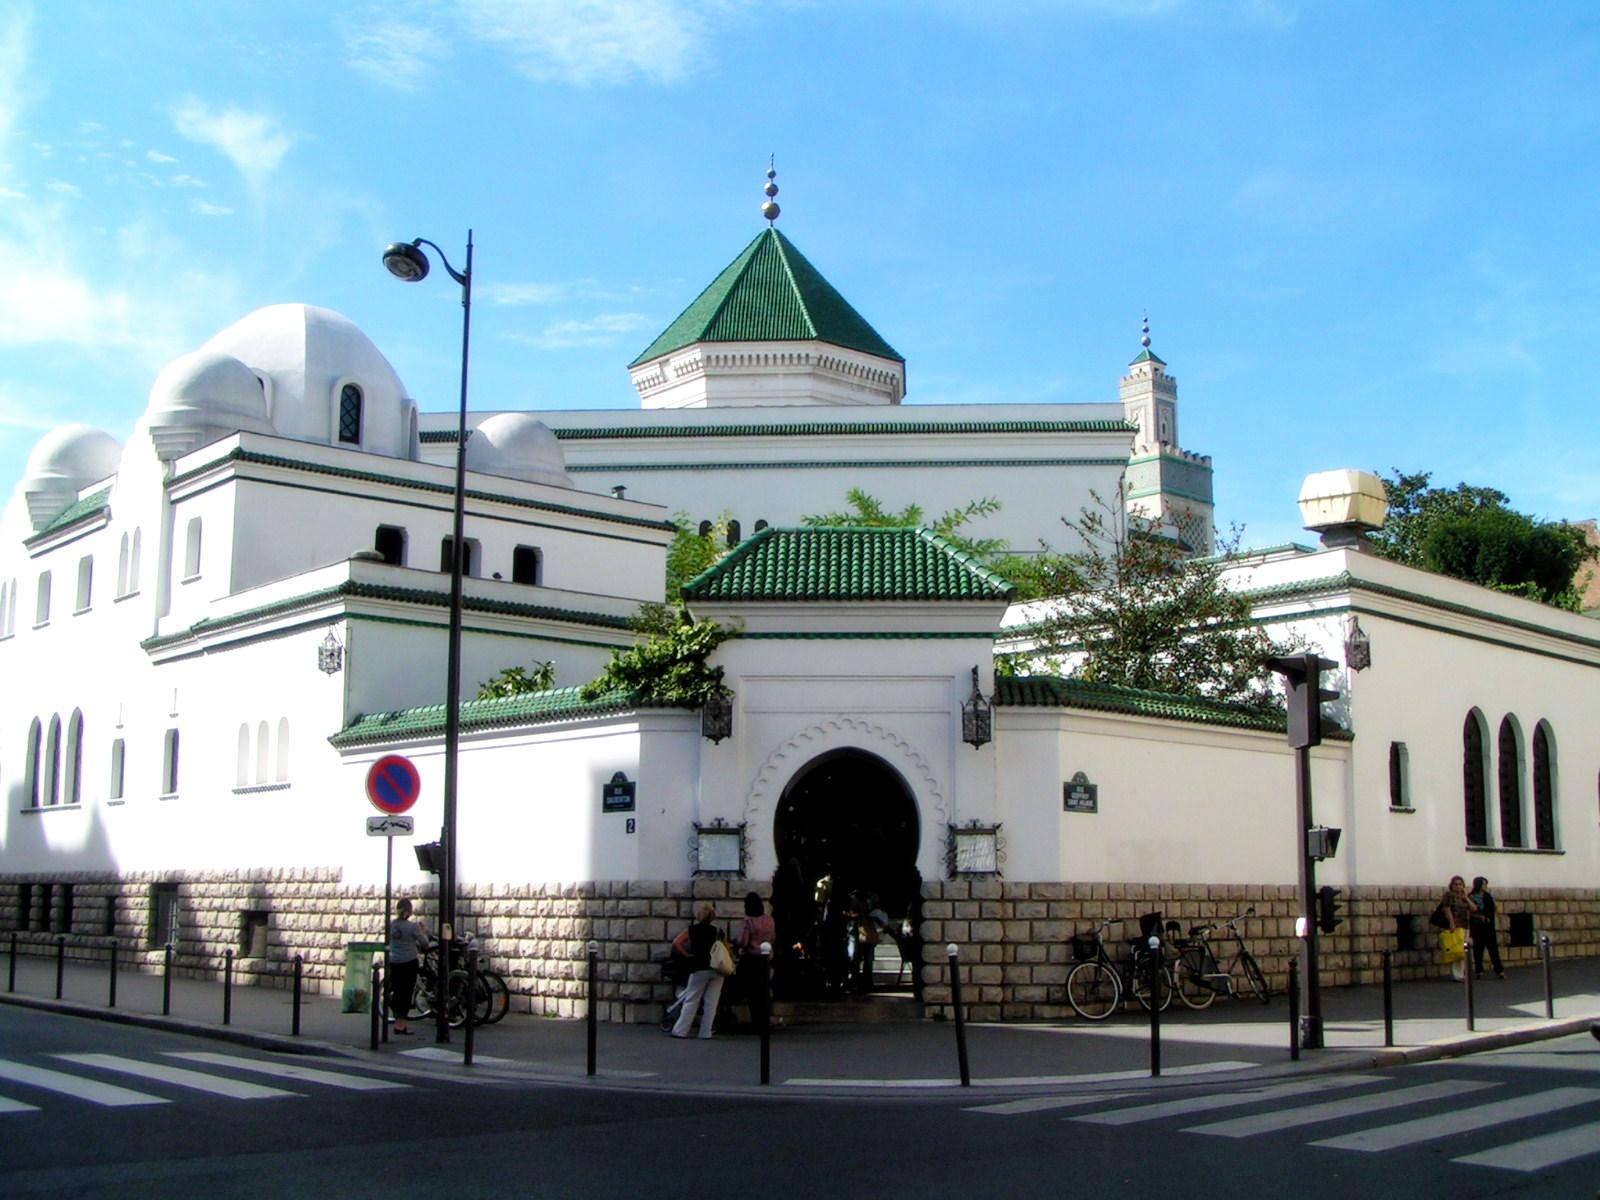 Masjid Raya Paris, Pesona Alhambra di Masjid Terbesar ke-3 se-Eropa